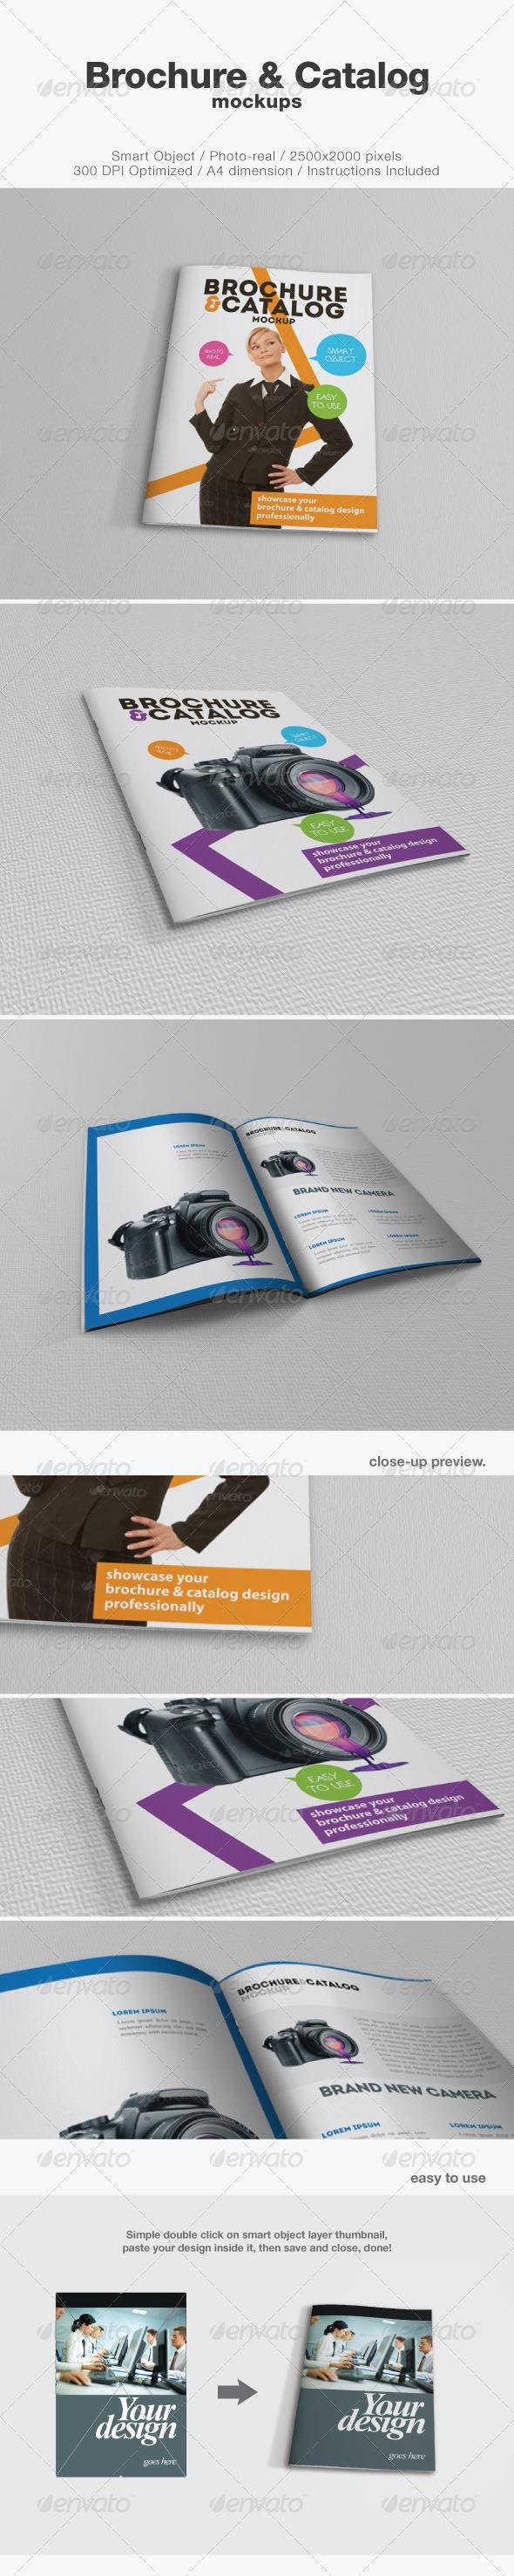 GraphicRiver Brochure and Catalog Mockups 2677856